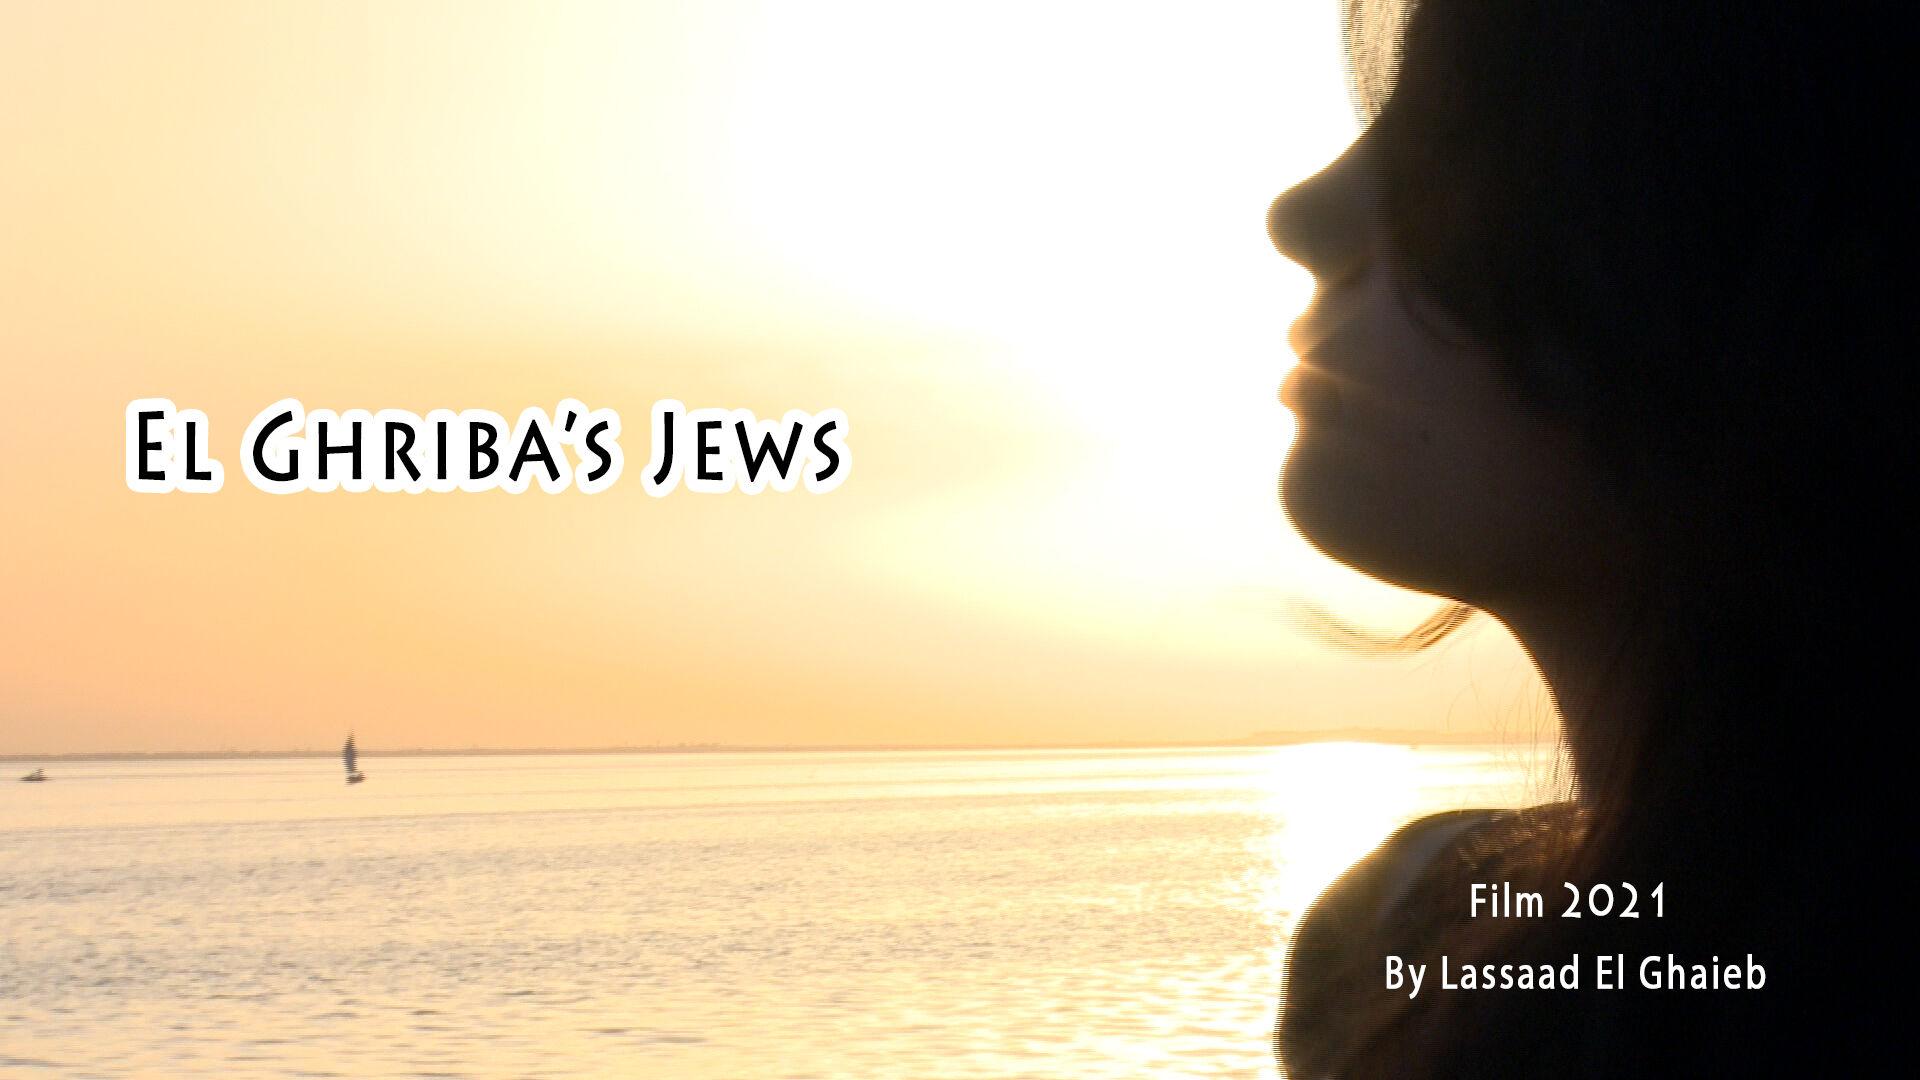 EL GHRIBA'S JEWS